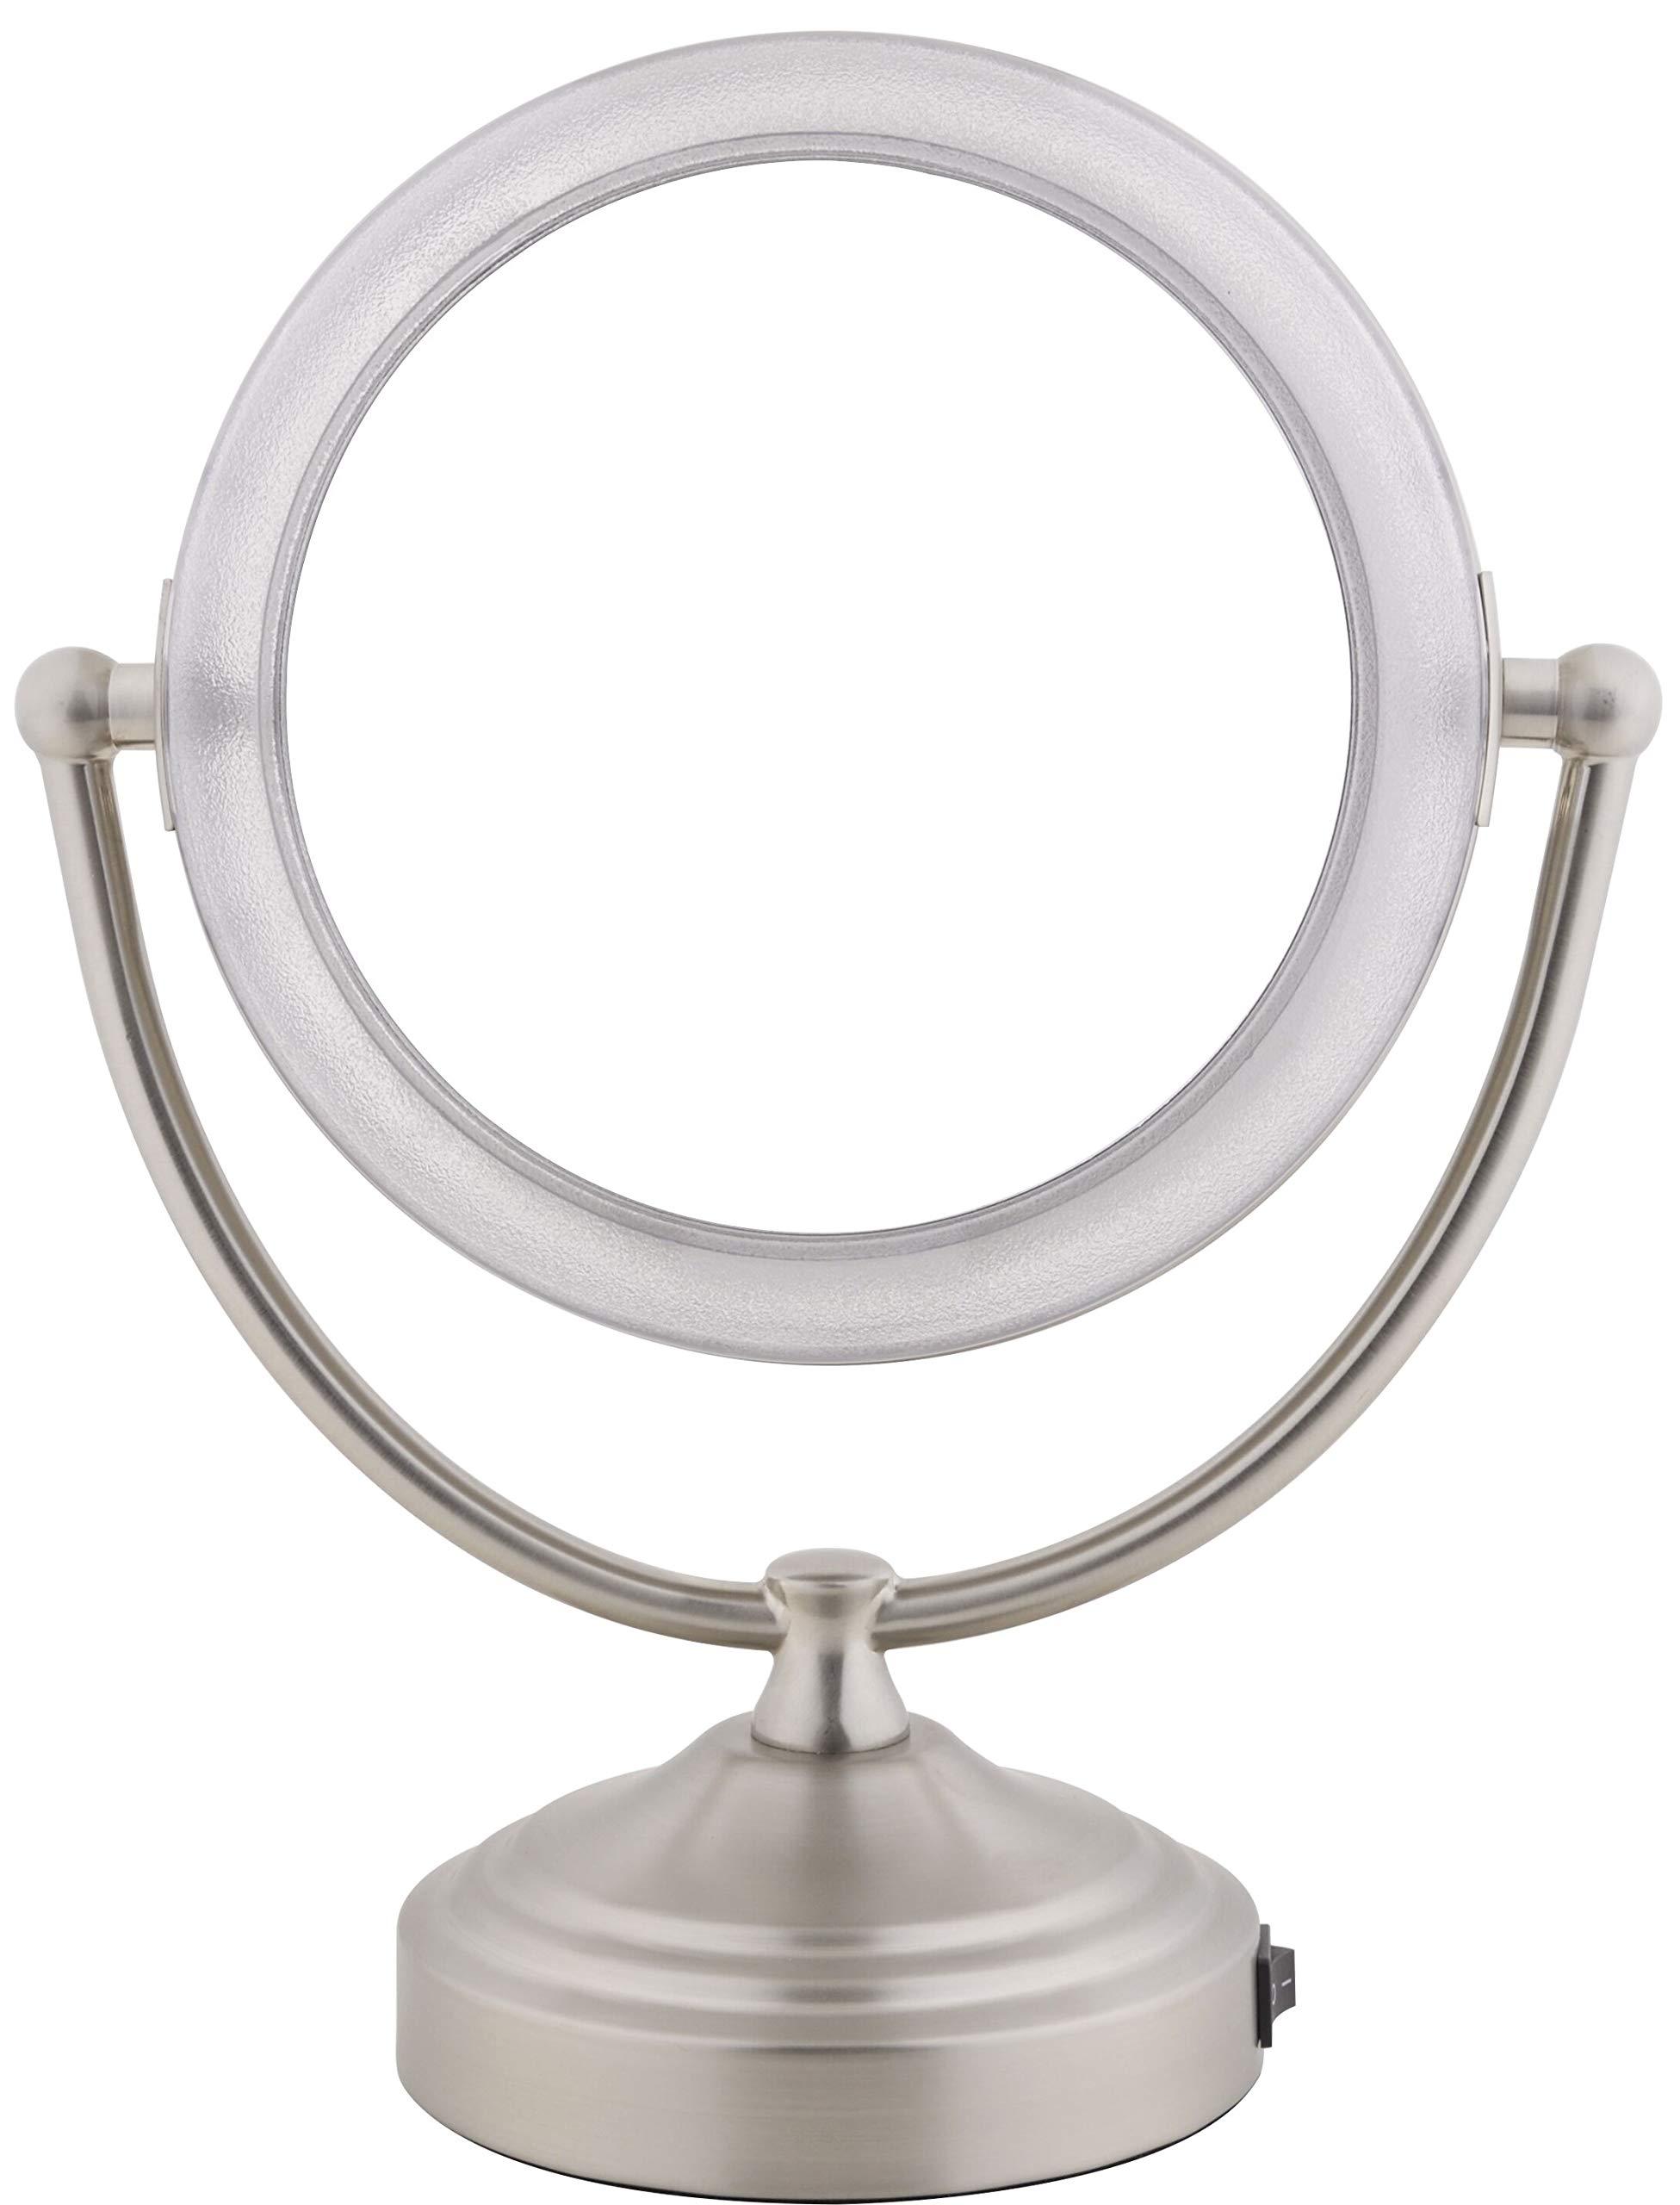 RIALTO Rialto Daylight cosmetic mirror by RIALTO